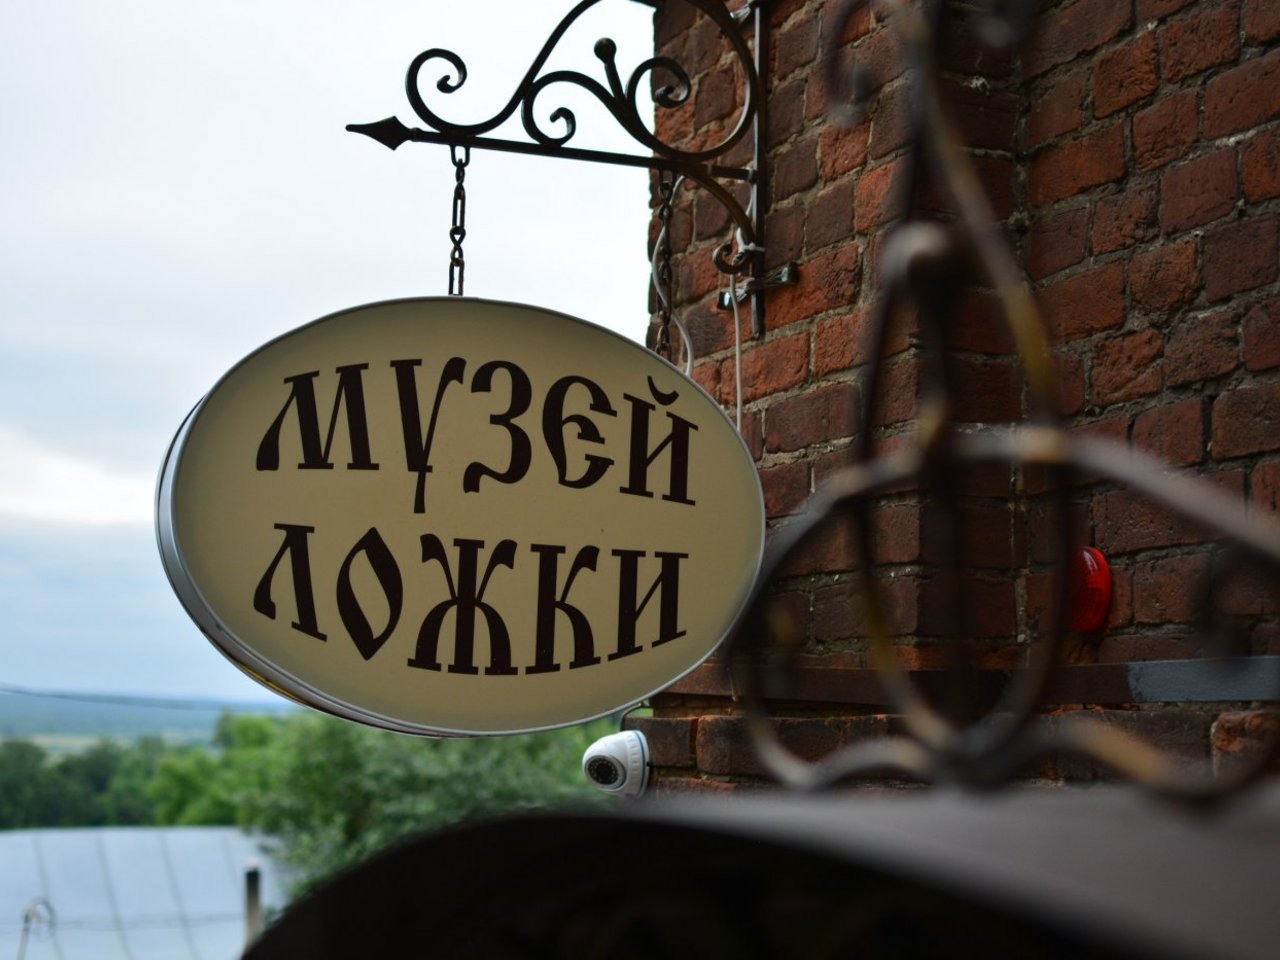 Музей ложки, Владимир